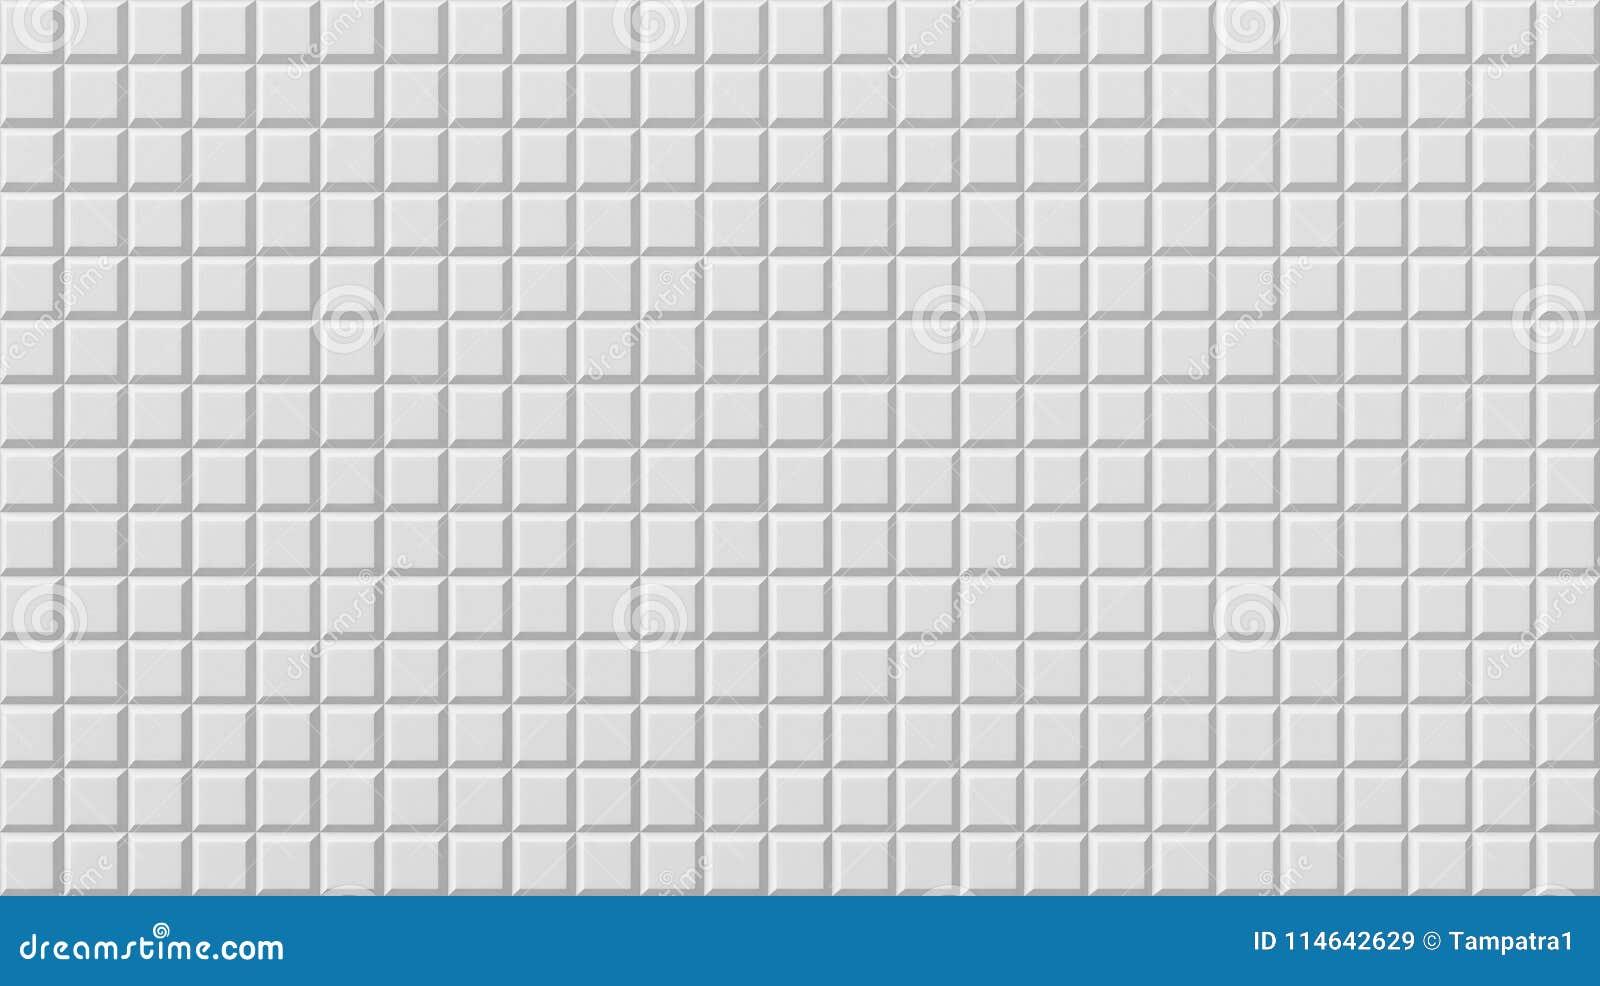 Download White Tile Flooring Seamless Texture Background 3d Stock Illustration